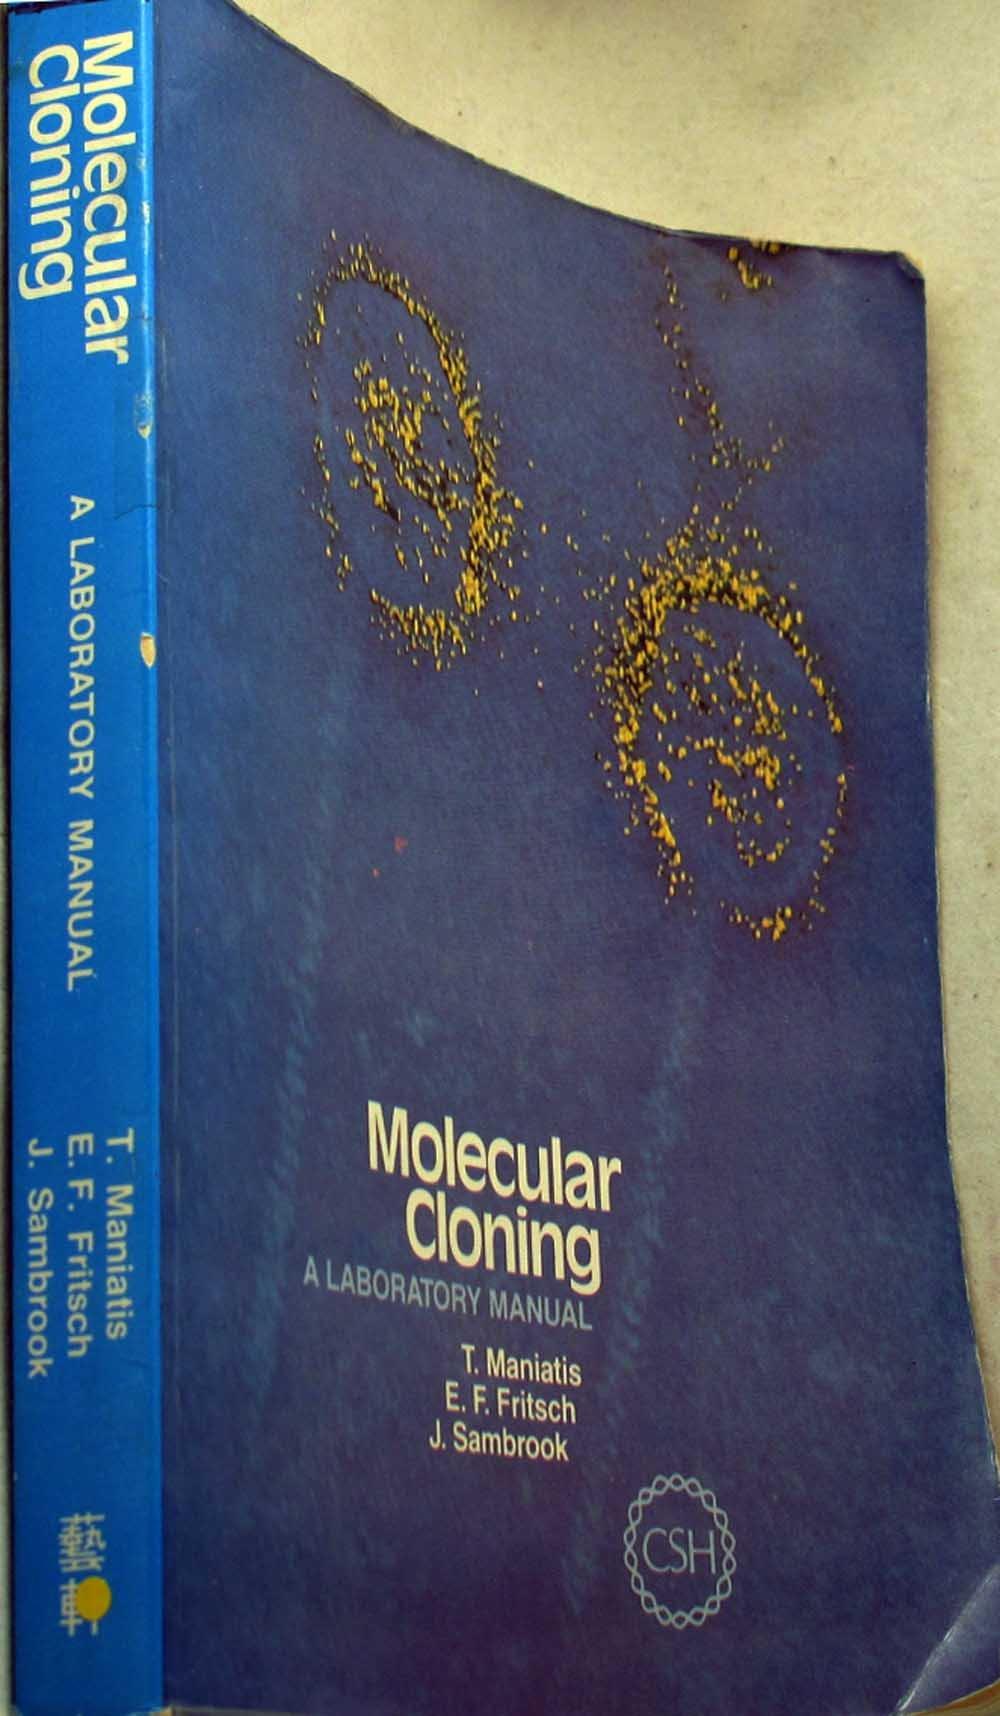 Molecular cloning: A laboratory manual: Amazon.co.uk: Tom Maniatis:  9780879691363: Books